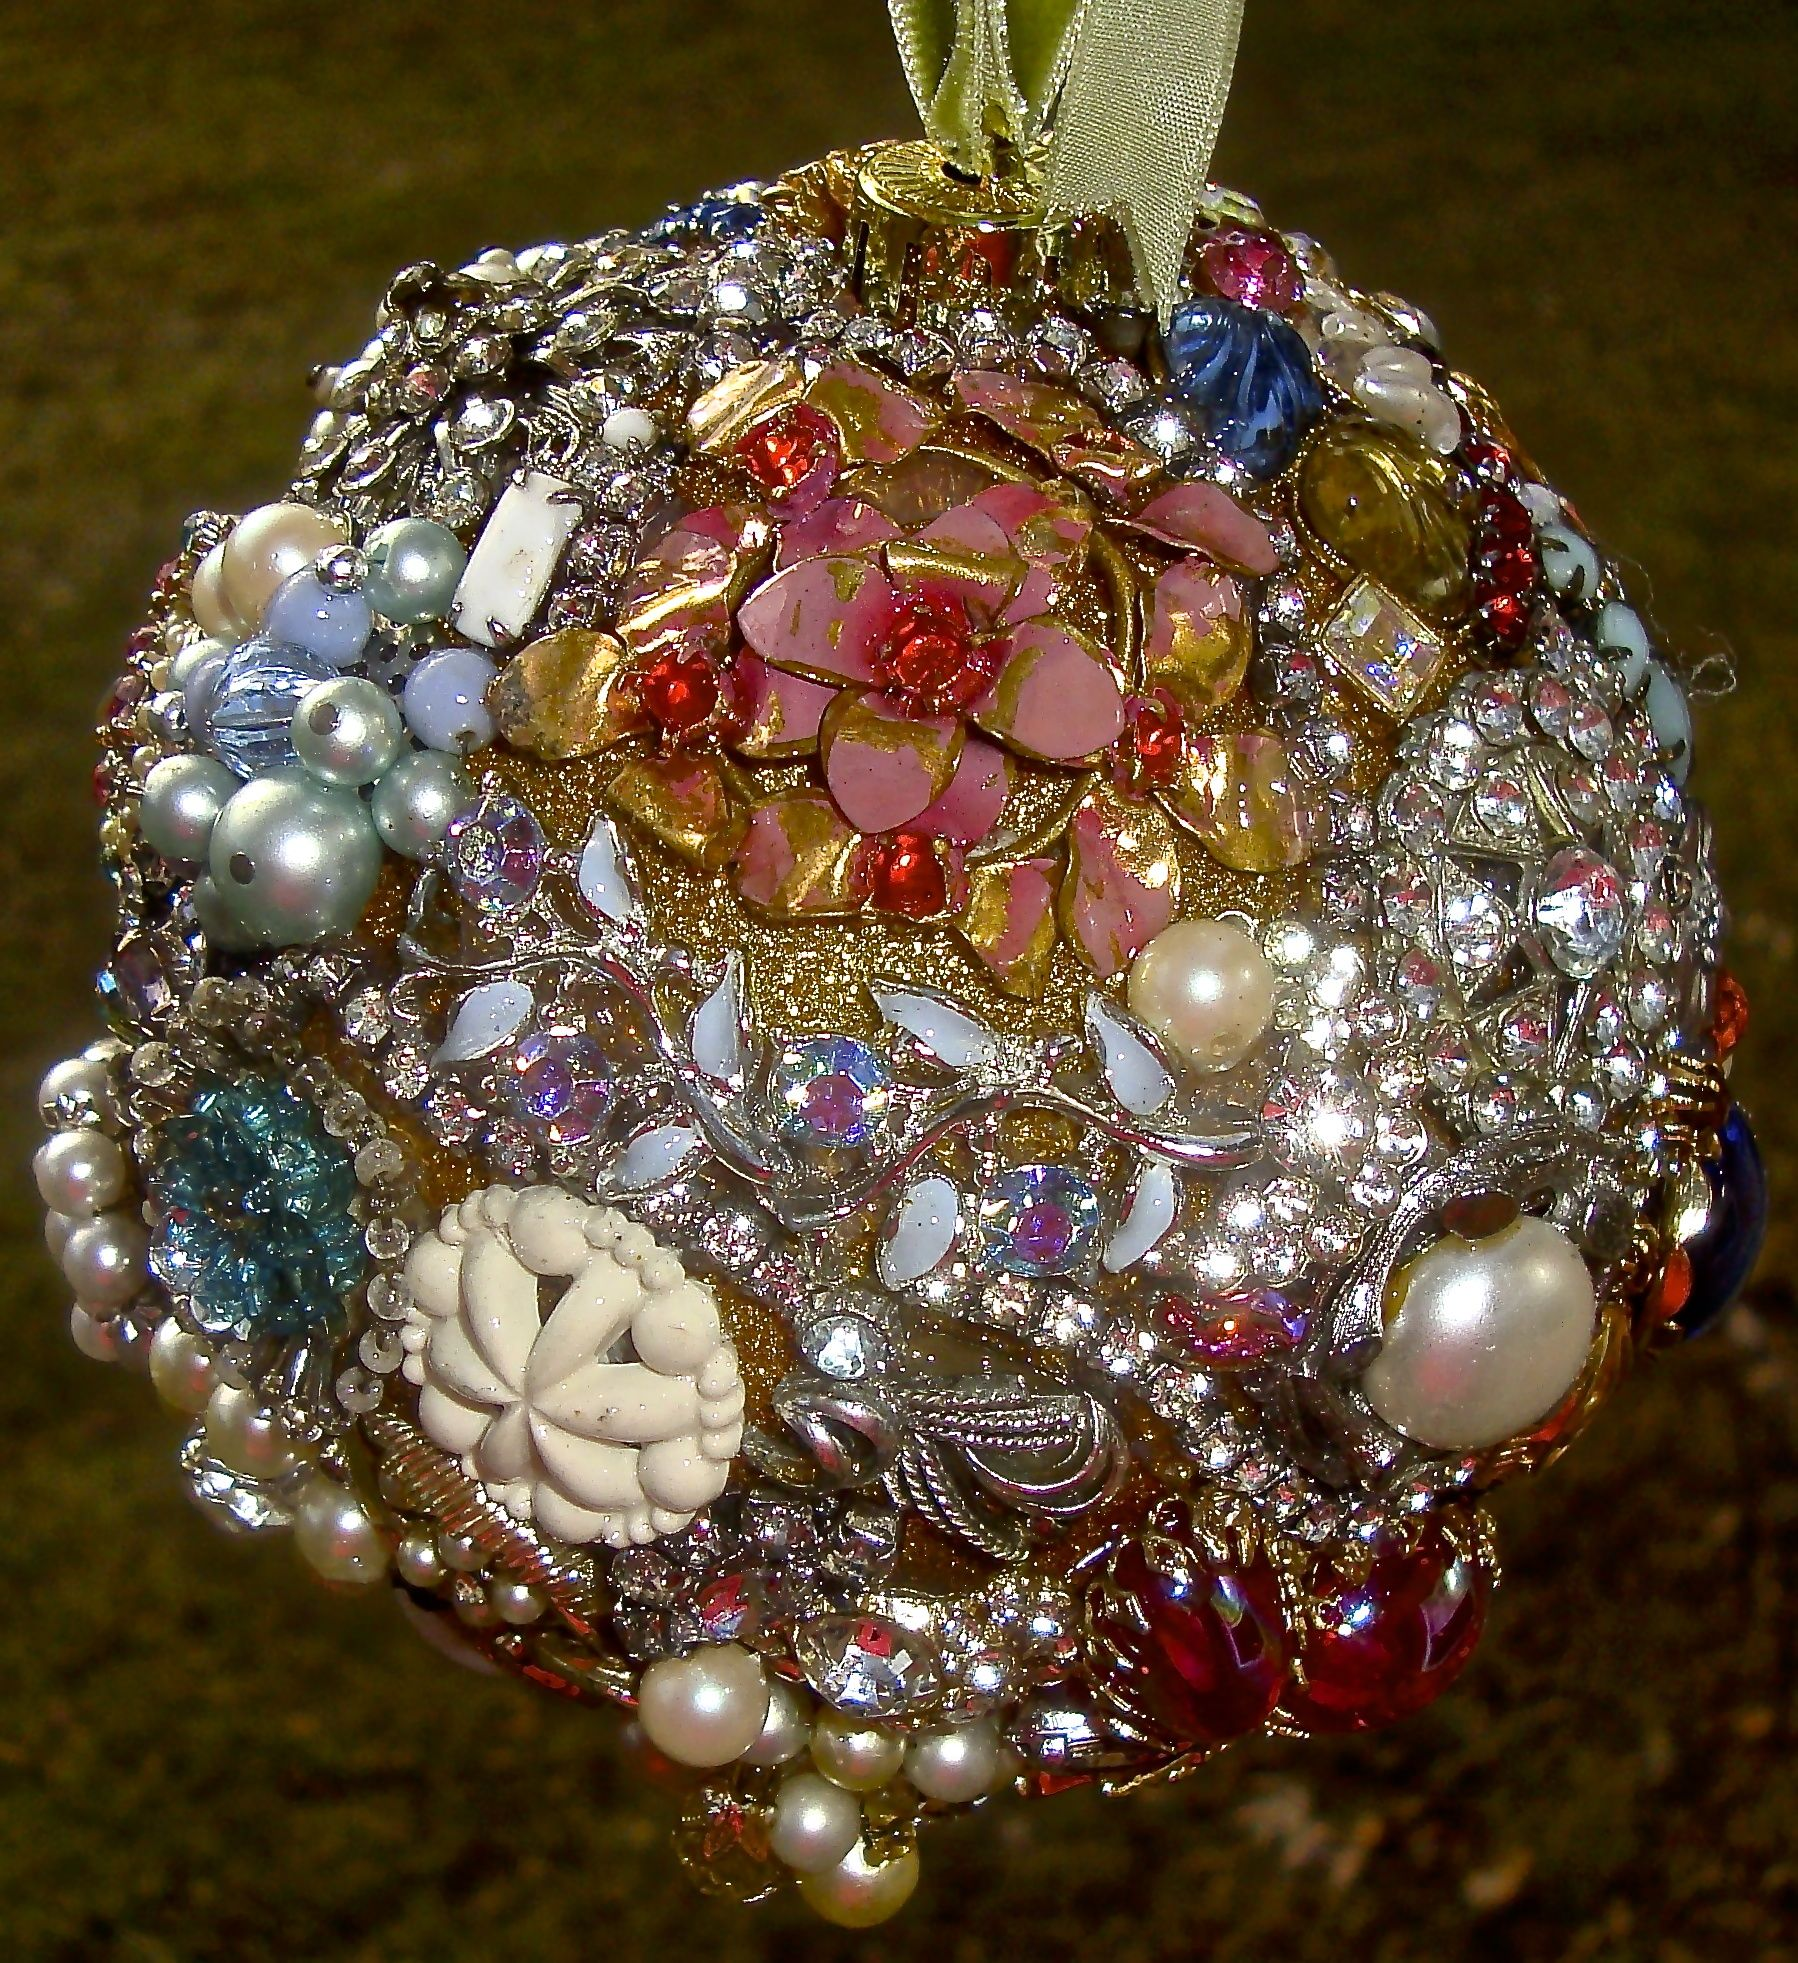 Wonderful Diy Ribbon Beads Christmas Tree: My Second Vintage Jeweled Ball Tree Ornament. I Glued Old